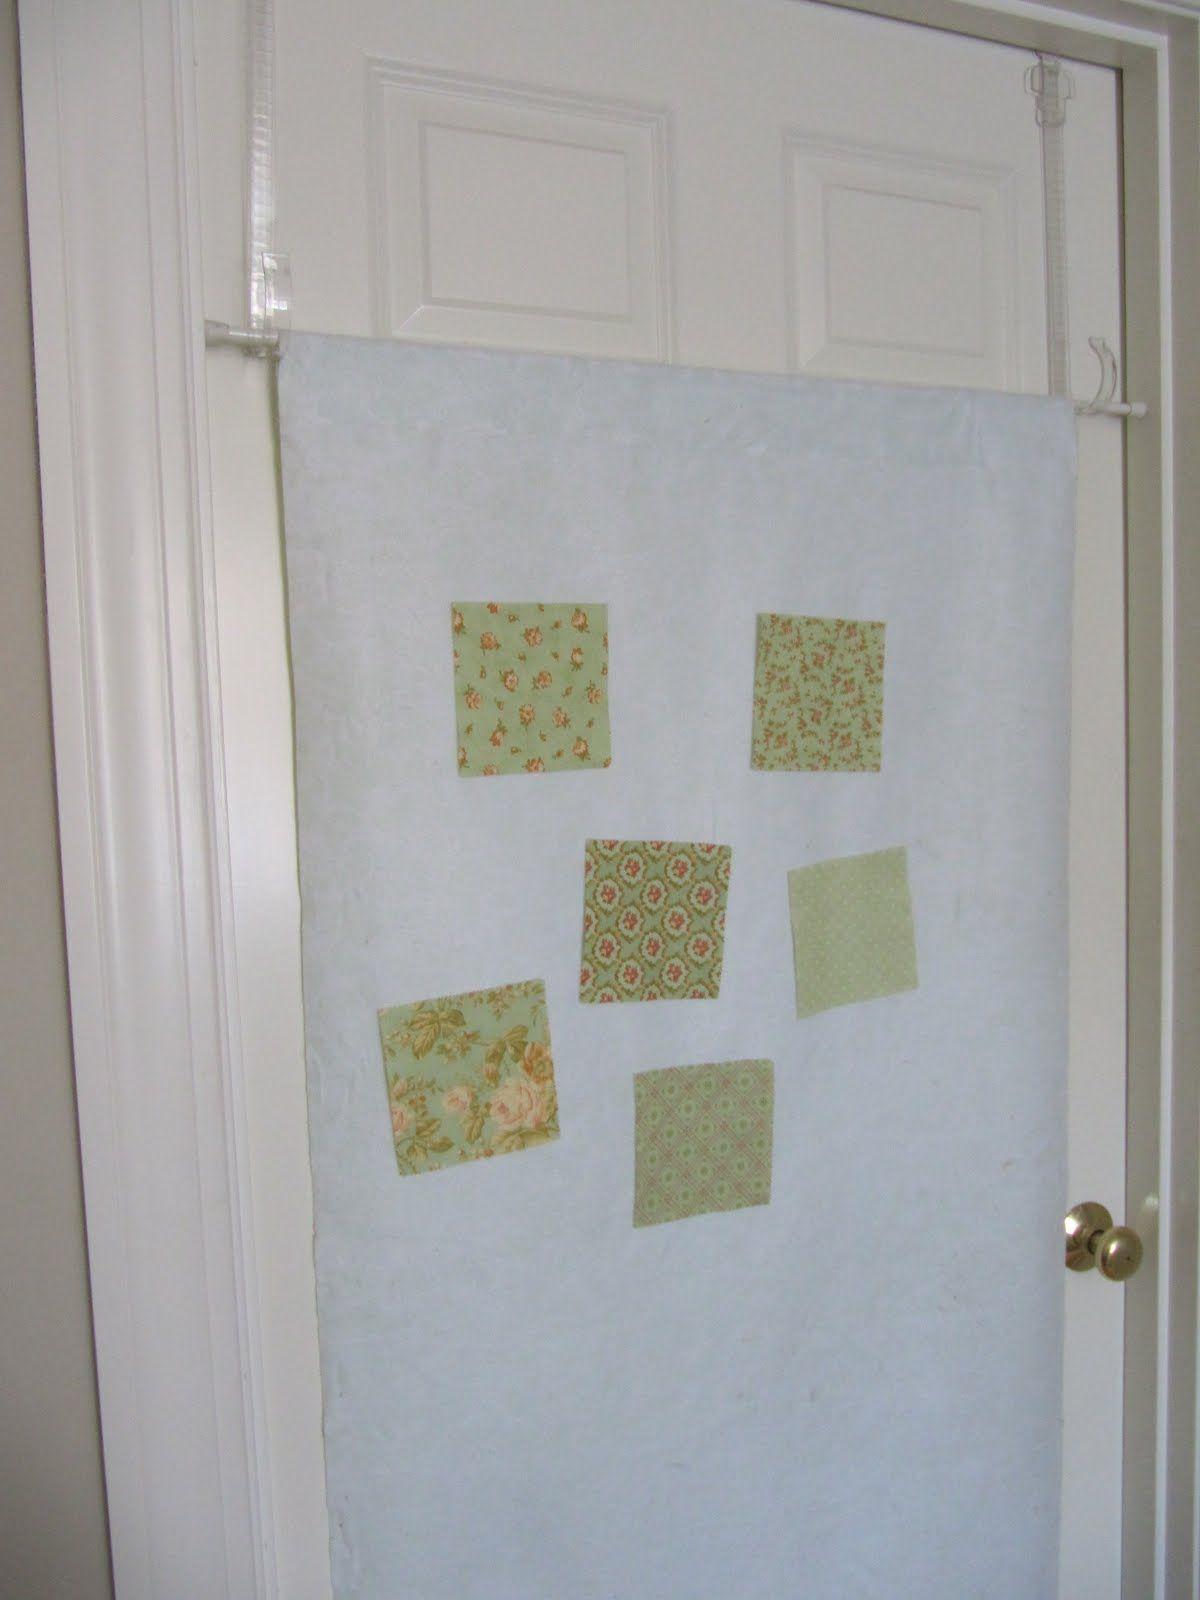 Sew Many Ways Tool Time Tuesday Door Design Wall Quilt Design Wall Quilting Room Wall Design